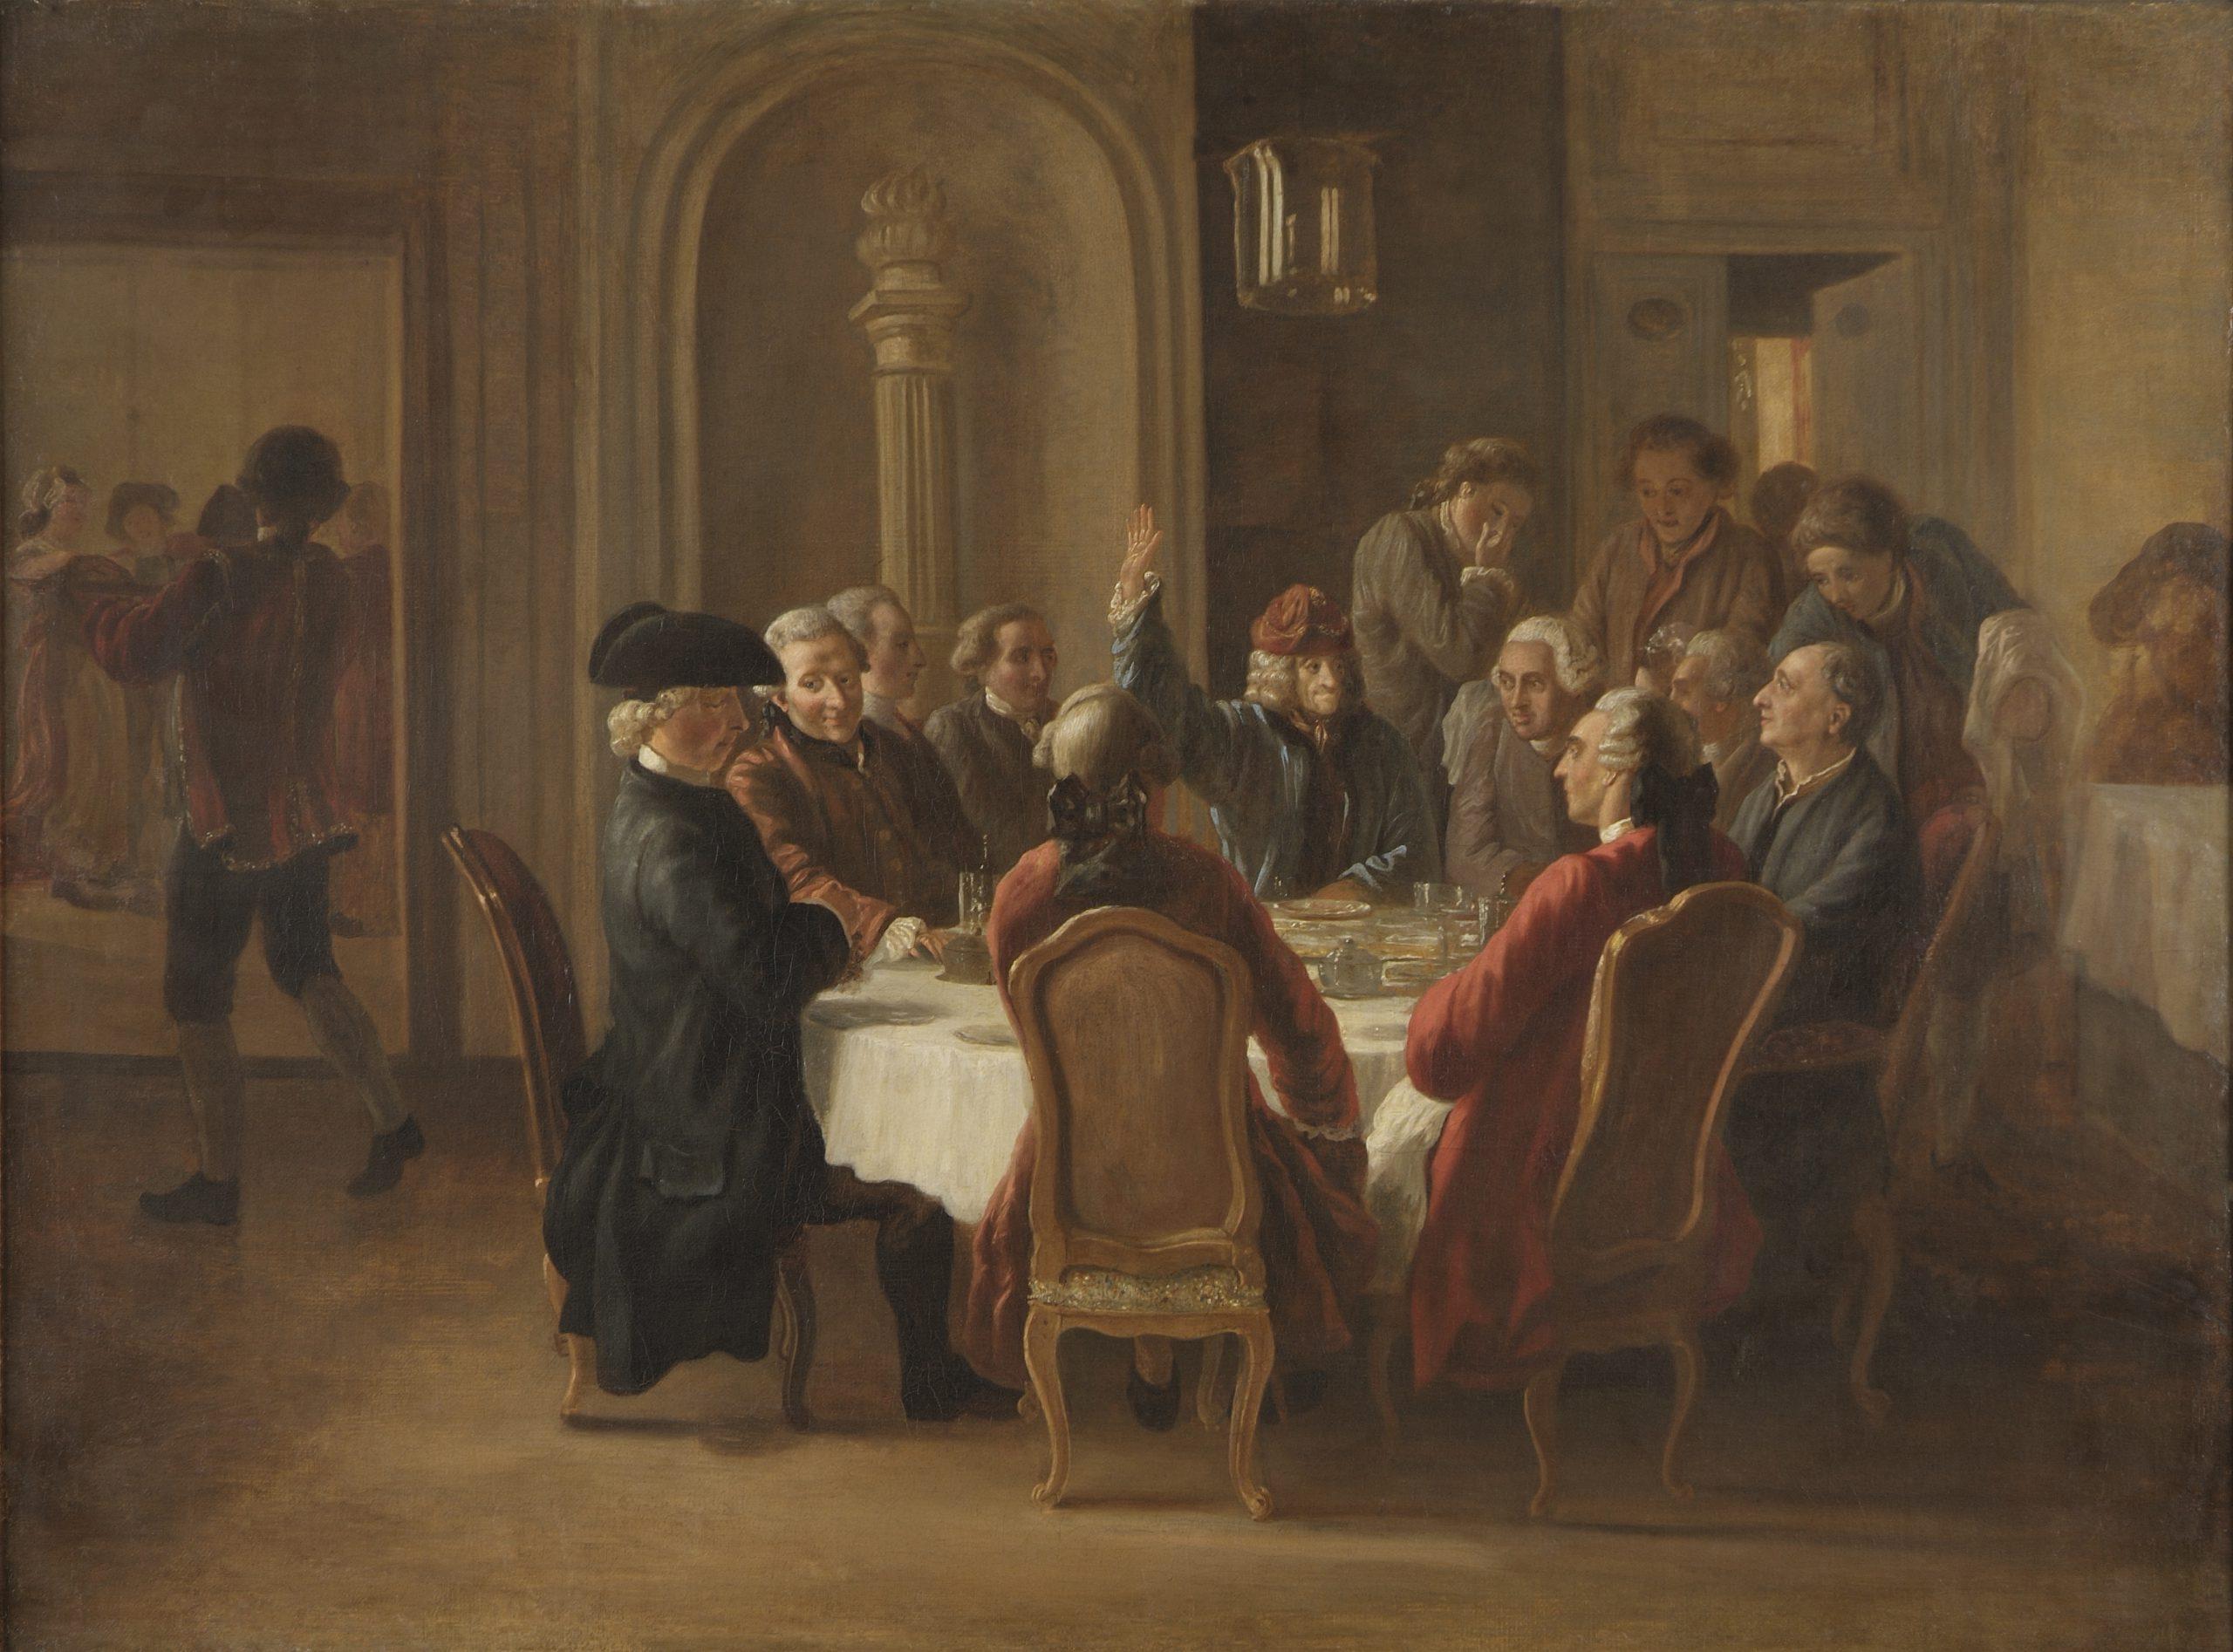 Diner de philosophes